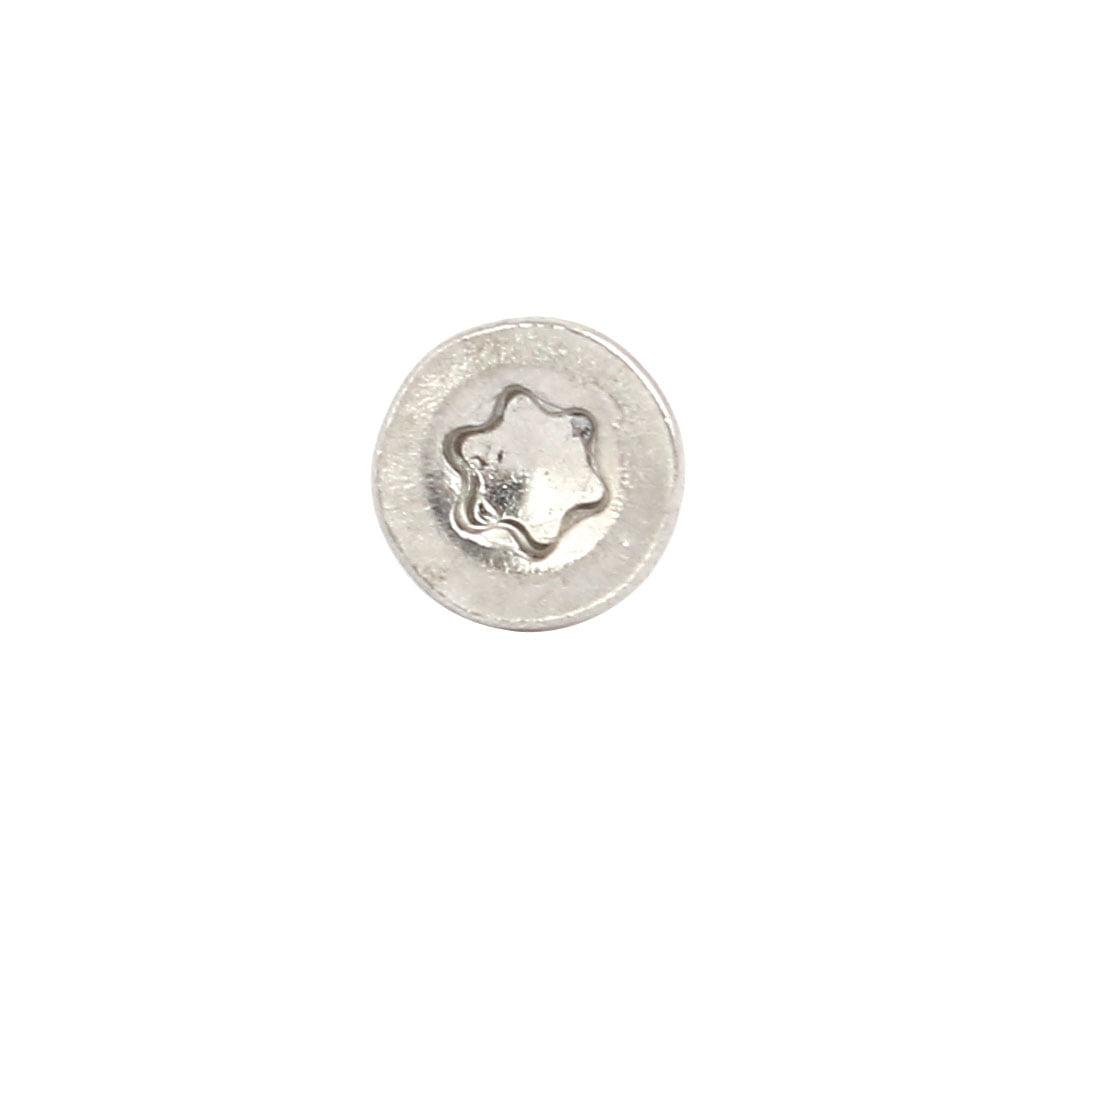 M3x25mm 304 Stainless Steel Flat Head Torx Drive Type Screw Silver Tone 50pcs - image 2 of 3